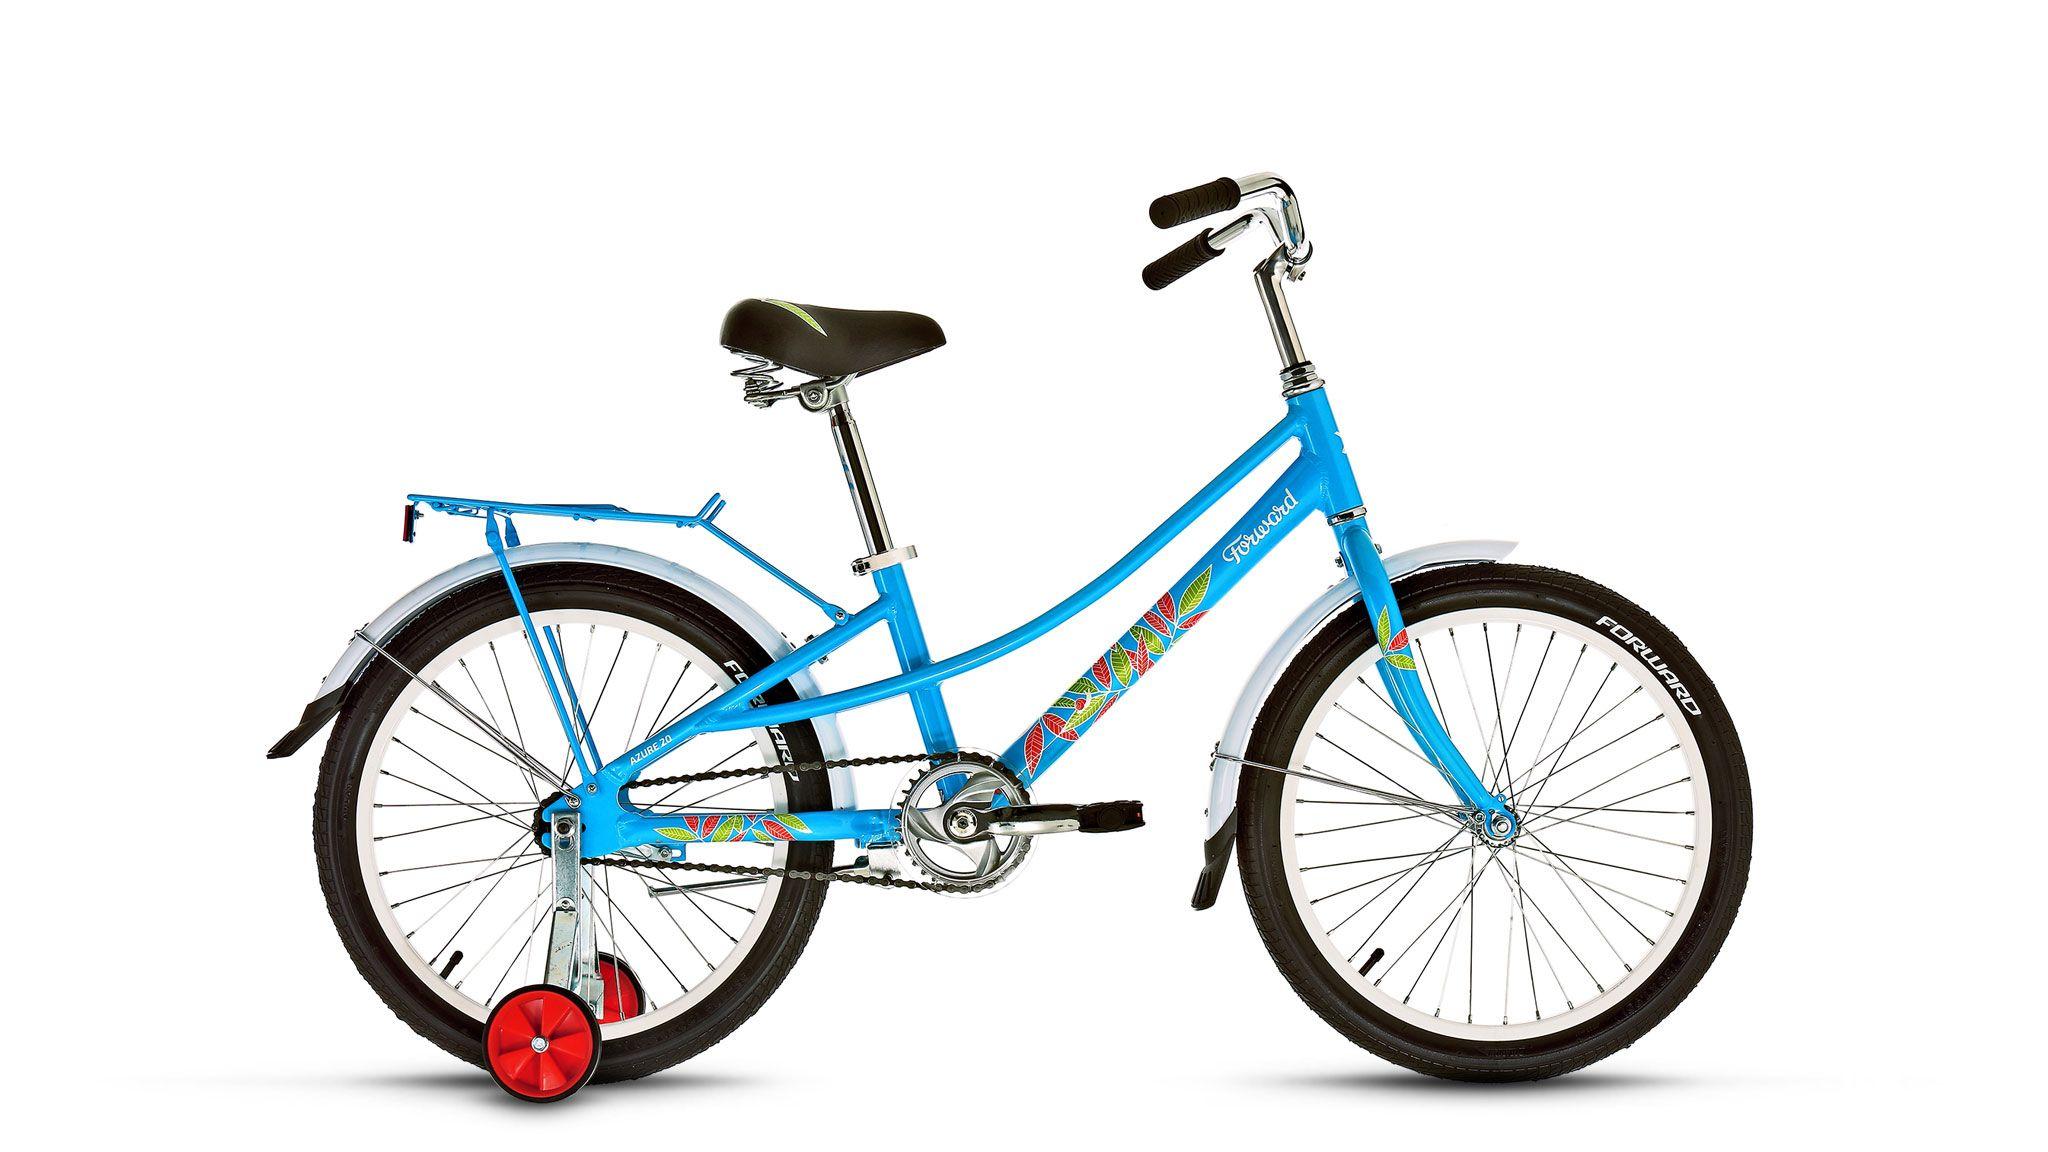 FORWARD Велосипед Forward Azure 20 (2016) голубой 10.5 велосипед forward azure 1 0 17 2016 blue matte